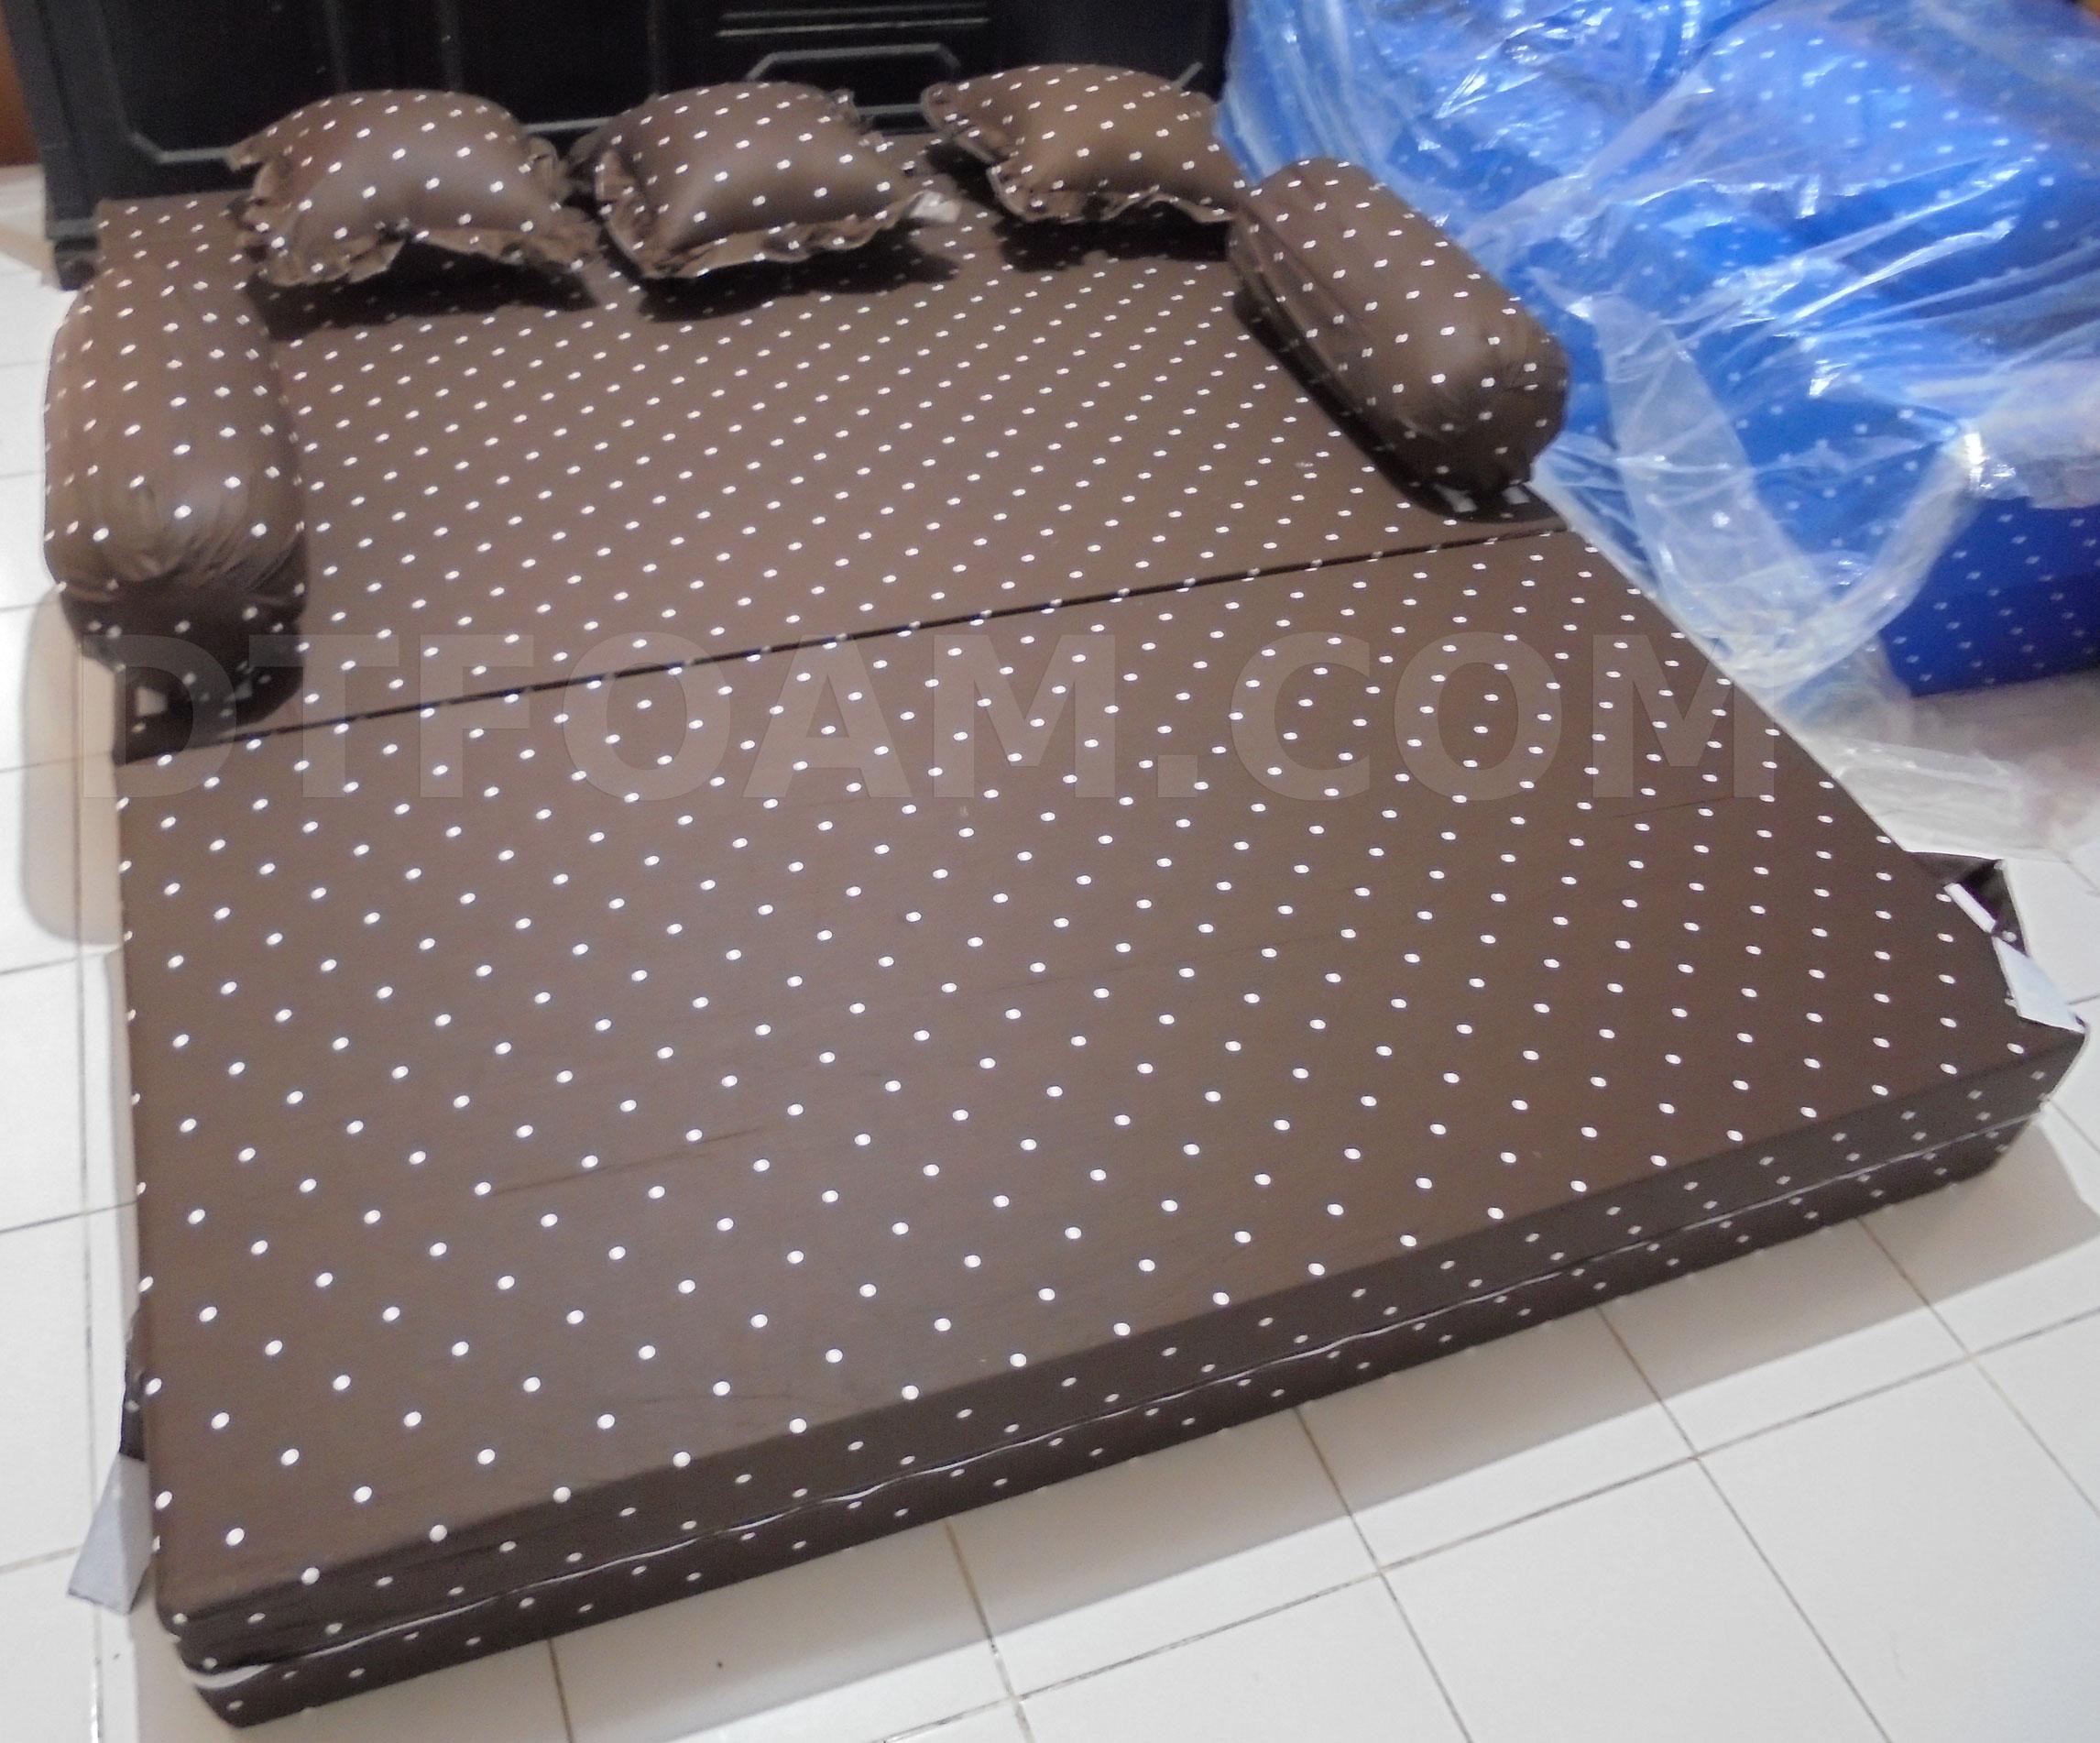 sofa bed kasur busa lipat inoac jakarta reupholstering multi fungsi dottie coklat minimalis murah